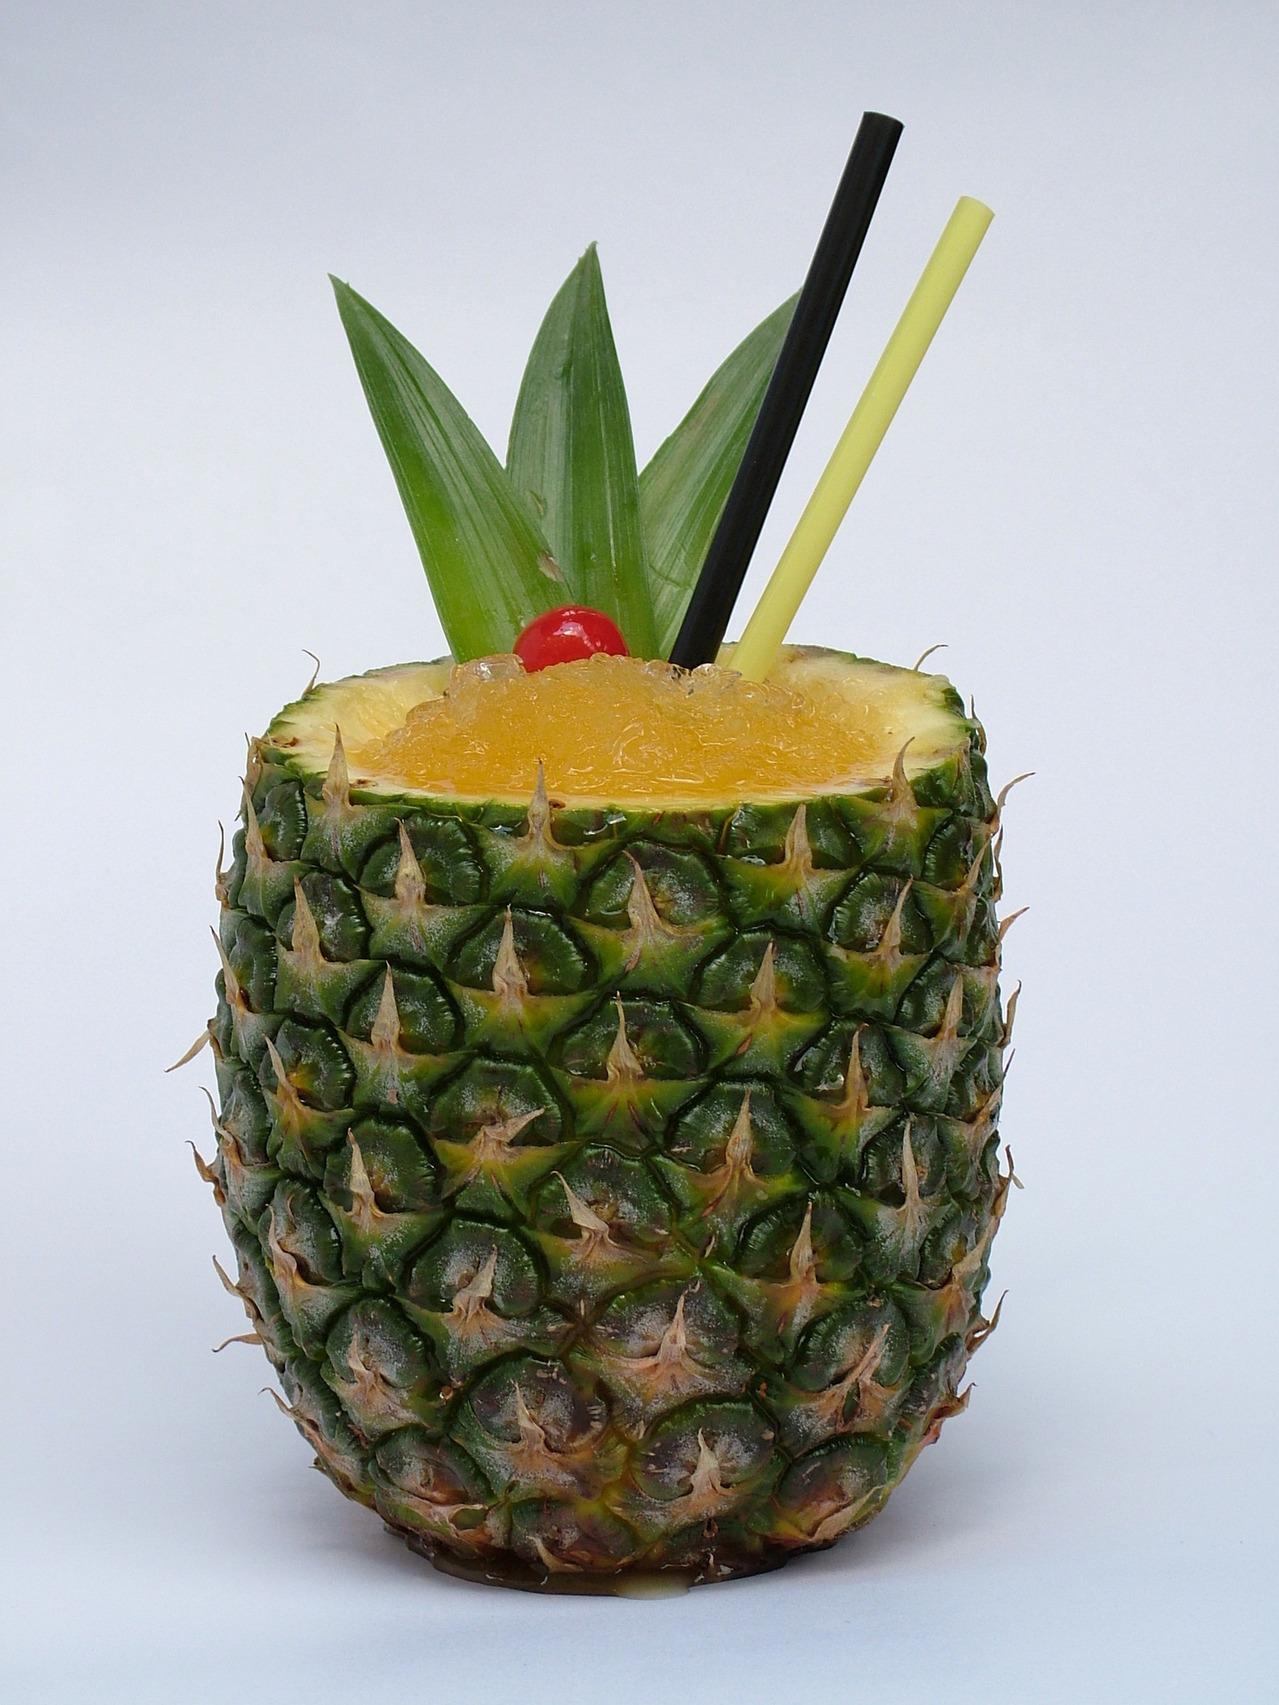 Grow Pineapple Trees, Like a Boss